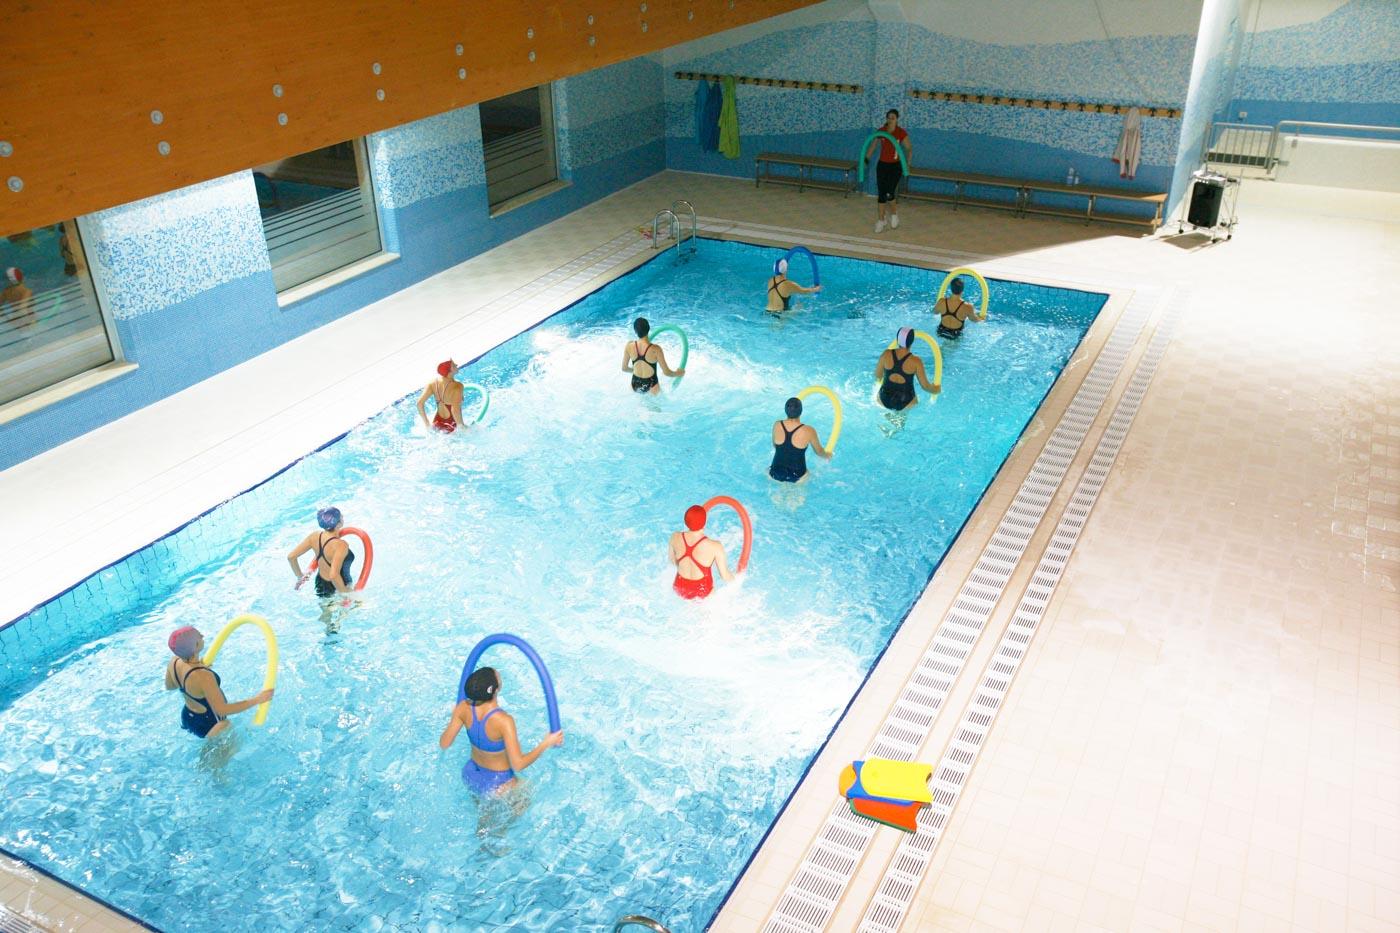 Piscina – Empire Sport Center à Calorie Piscine